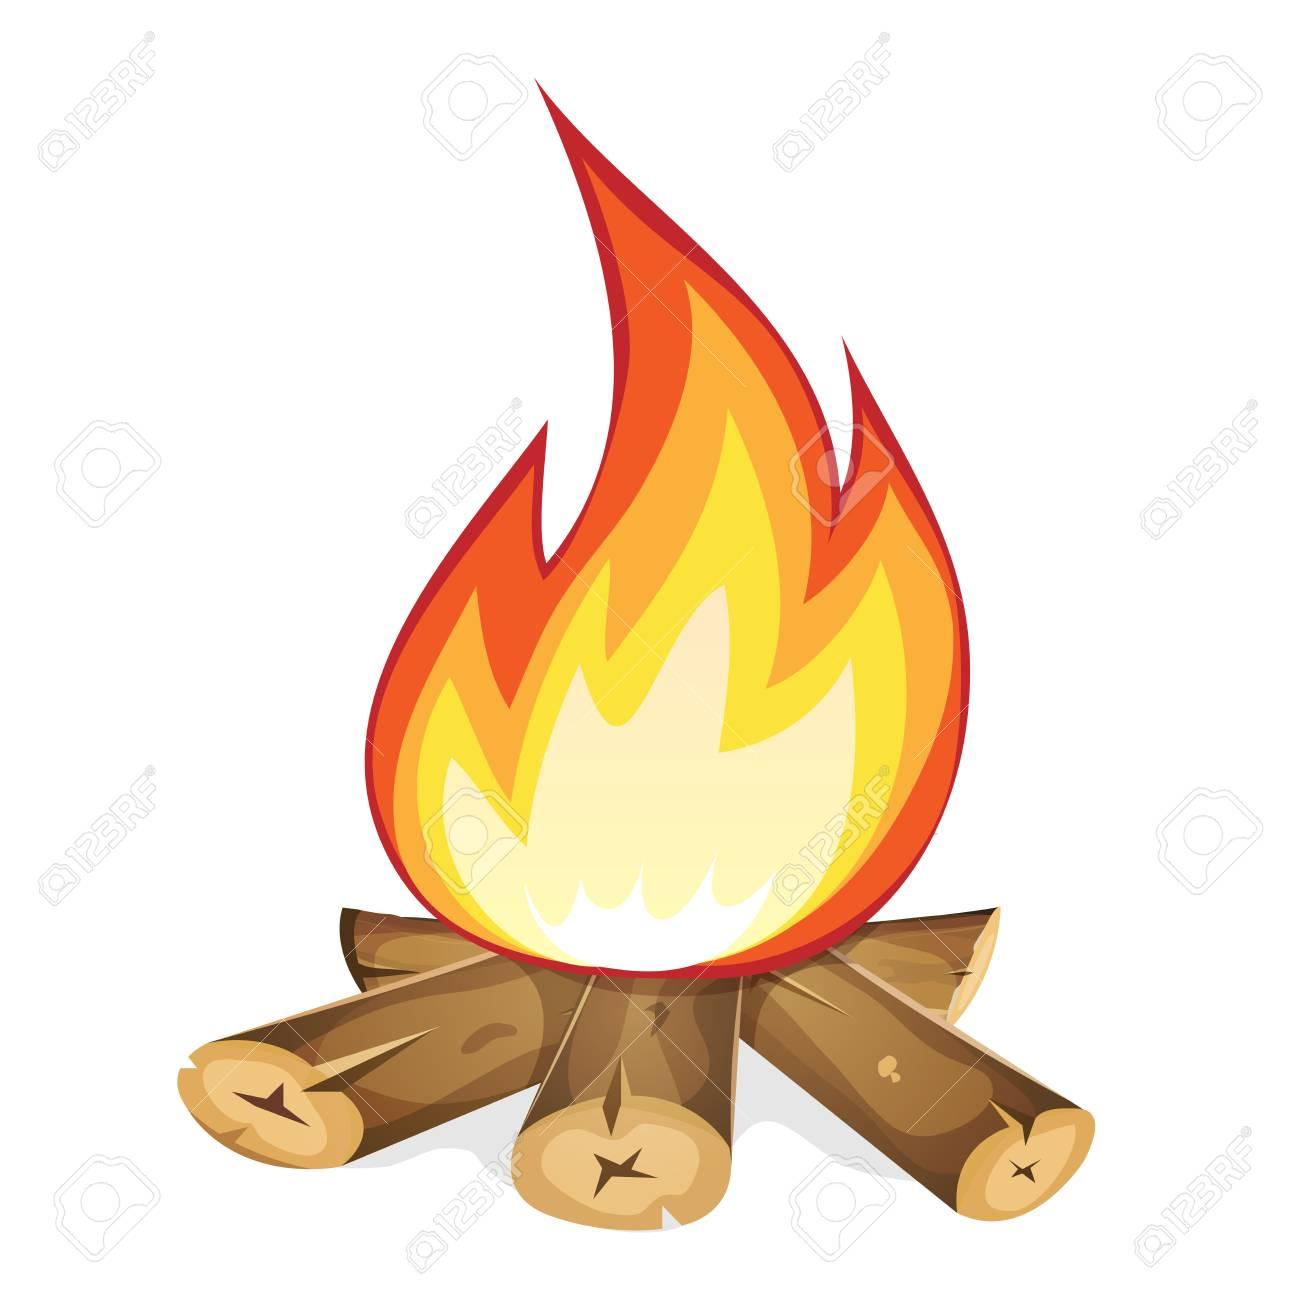 illustration of a cartoon bonfire burning with wood branch and rh 123rf com cartoon bonfire night images cartoon bonfire drawing